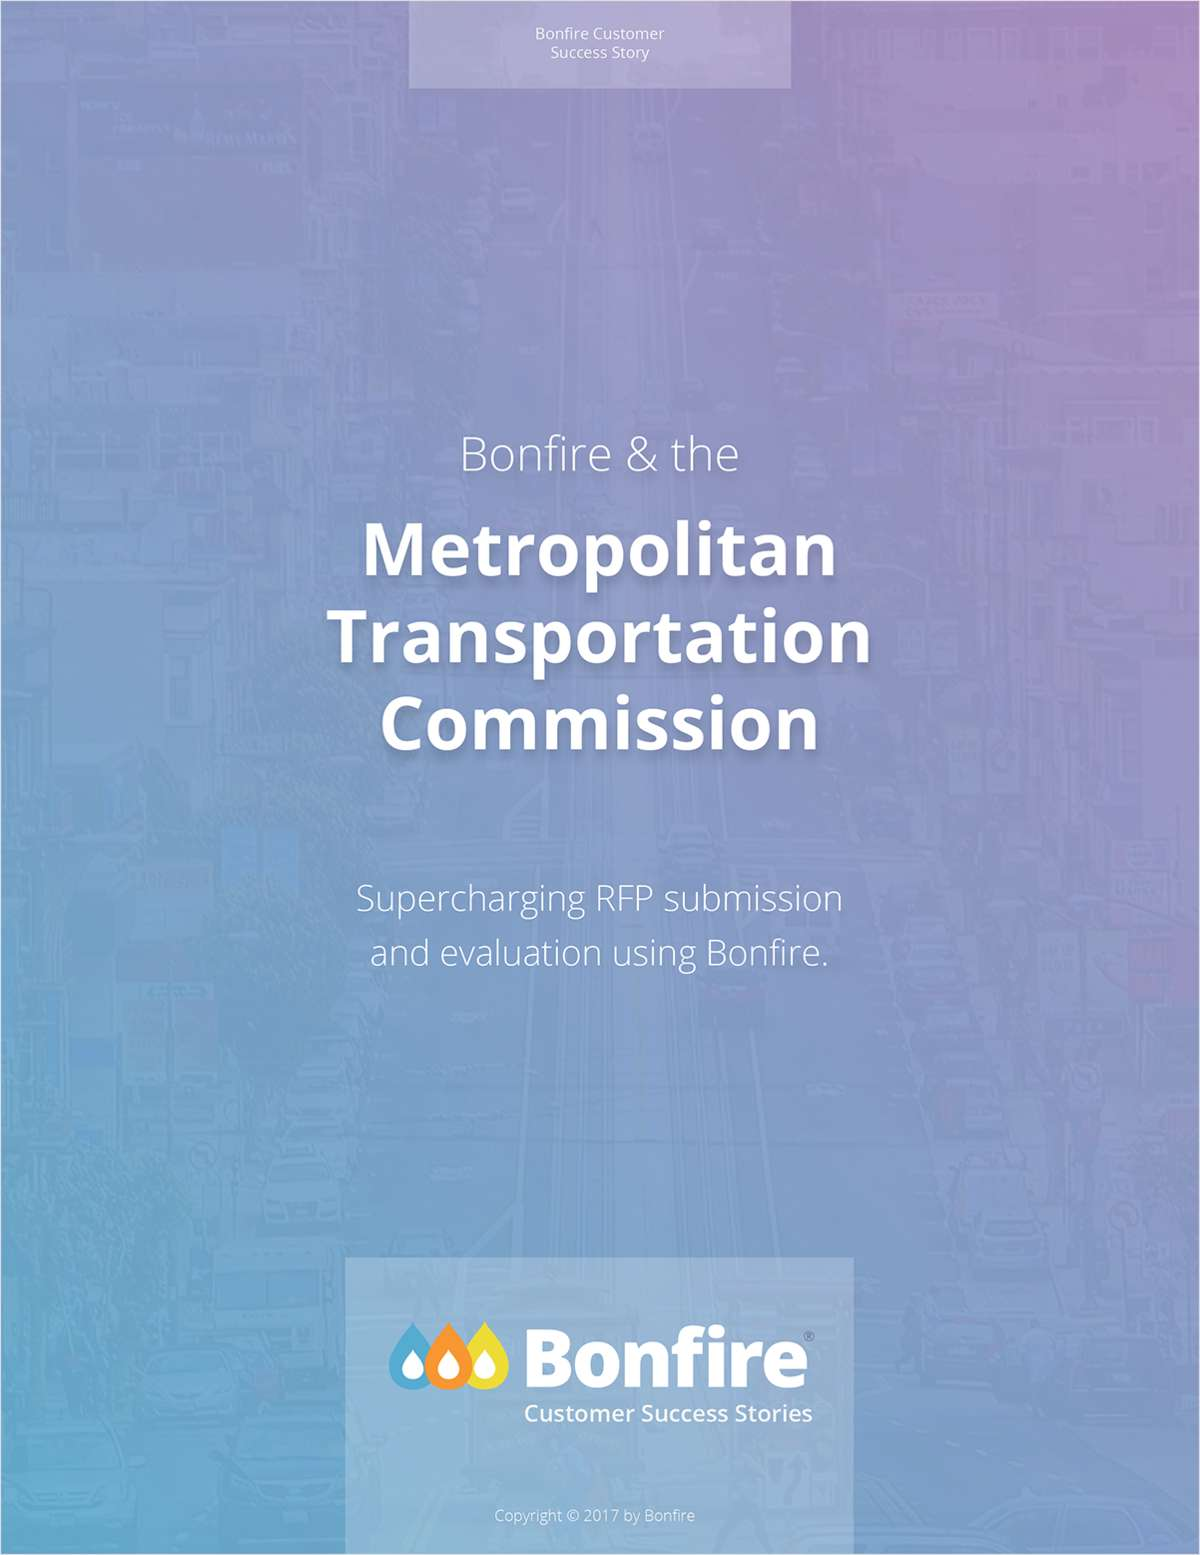 Bonfire & the Metropolitan Transportation Commission